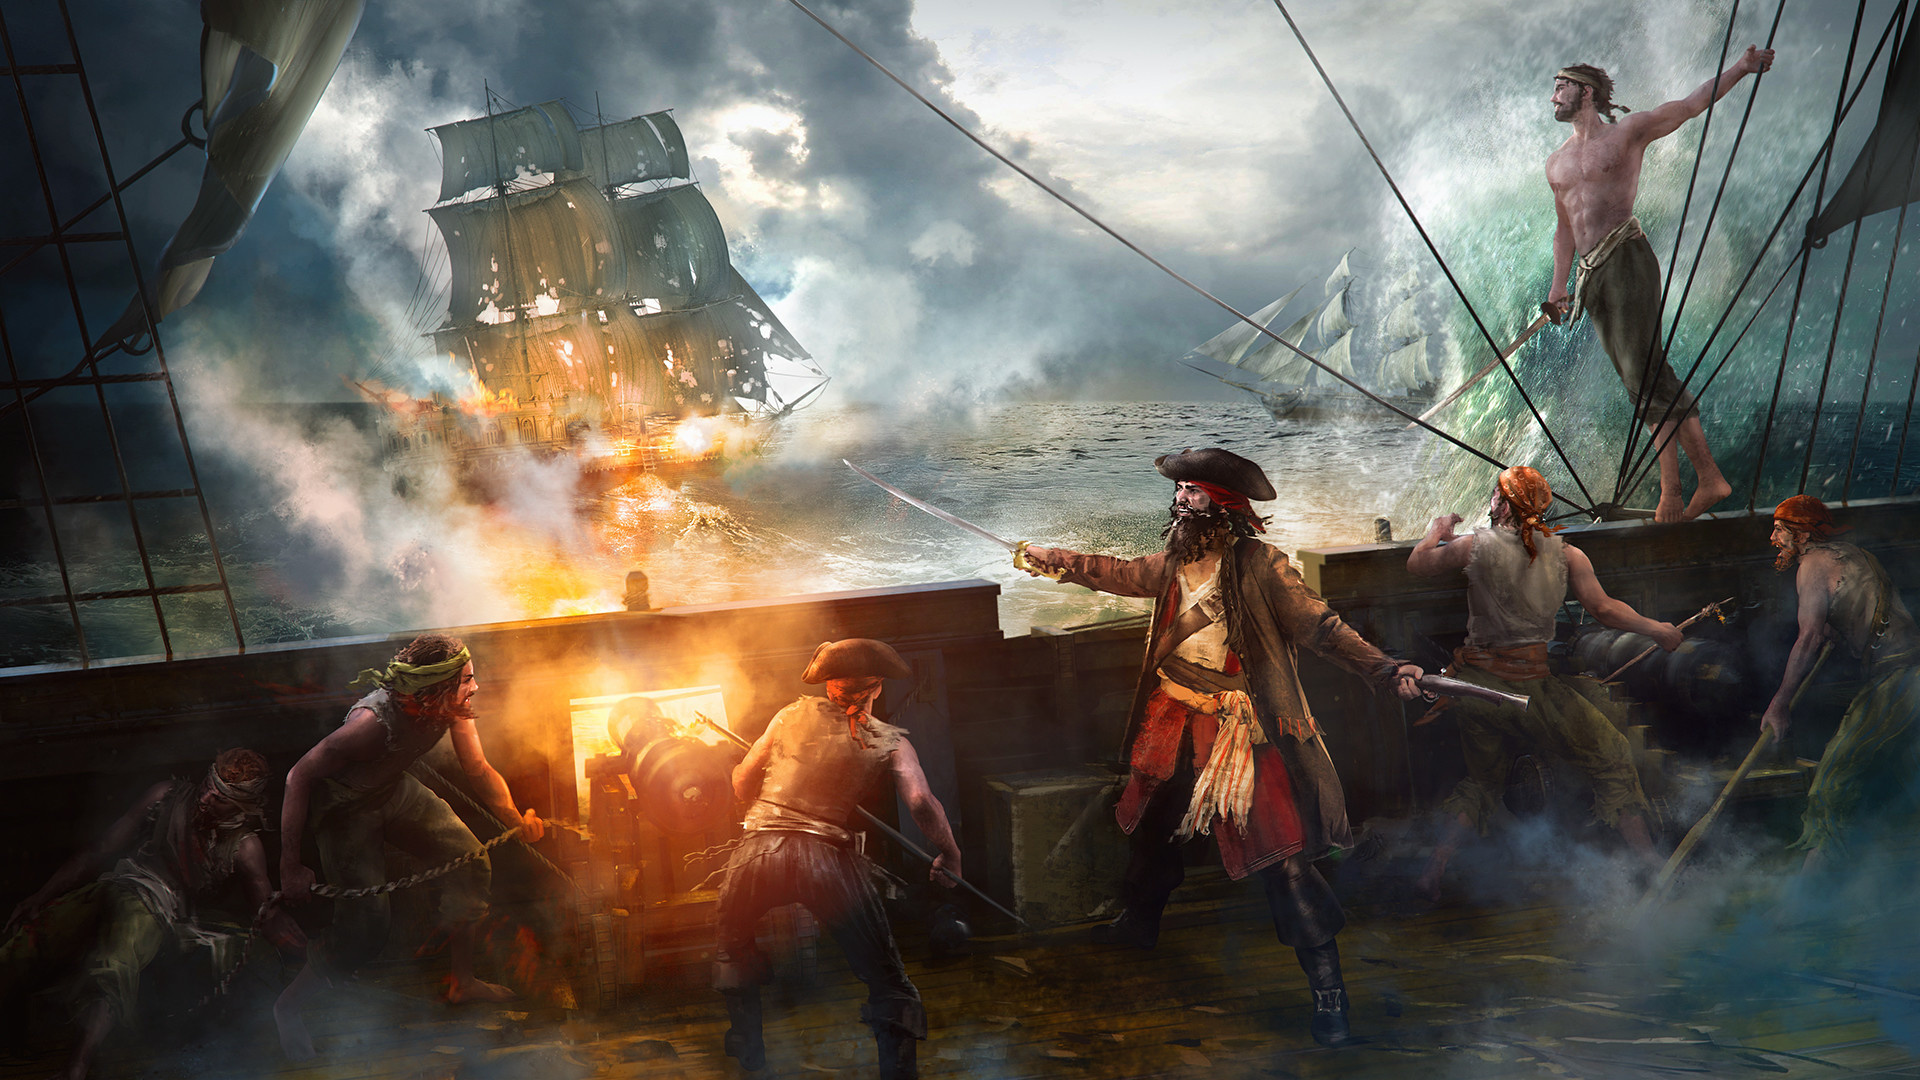 металла бои пиратов картинки сайта вправе снять